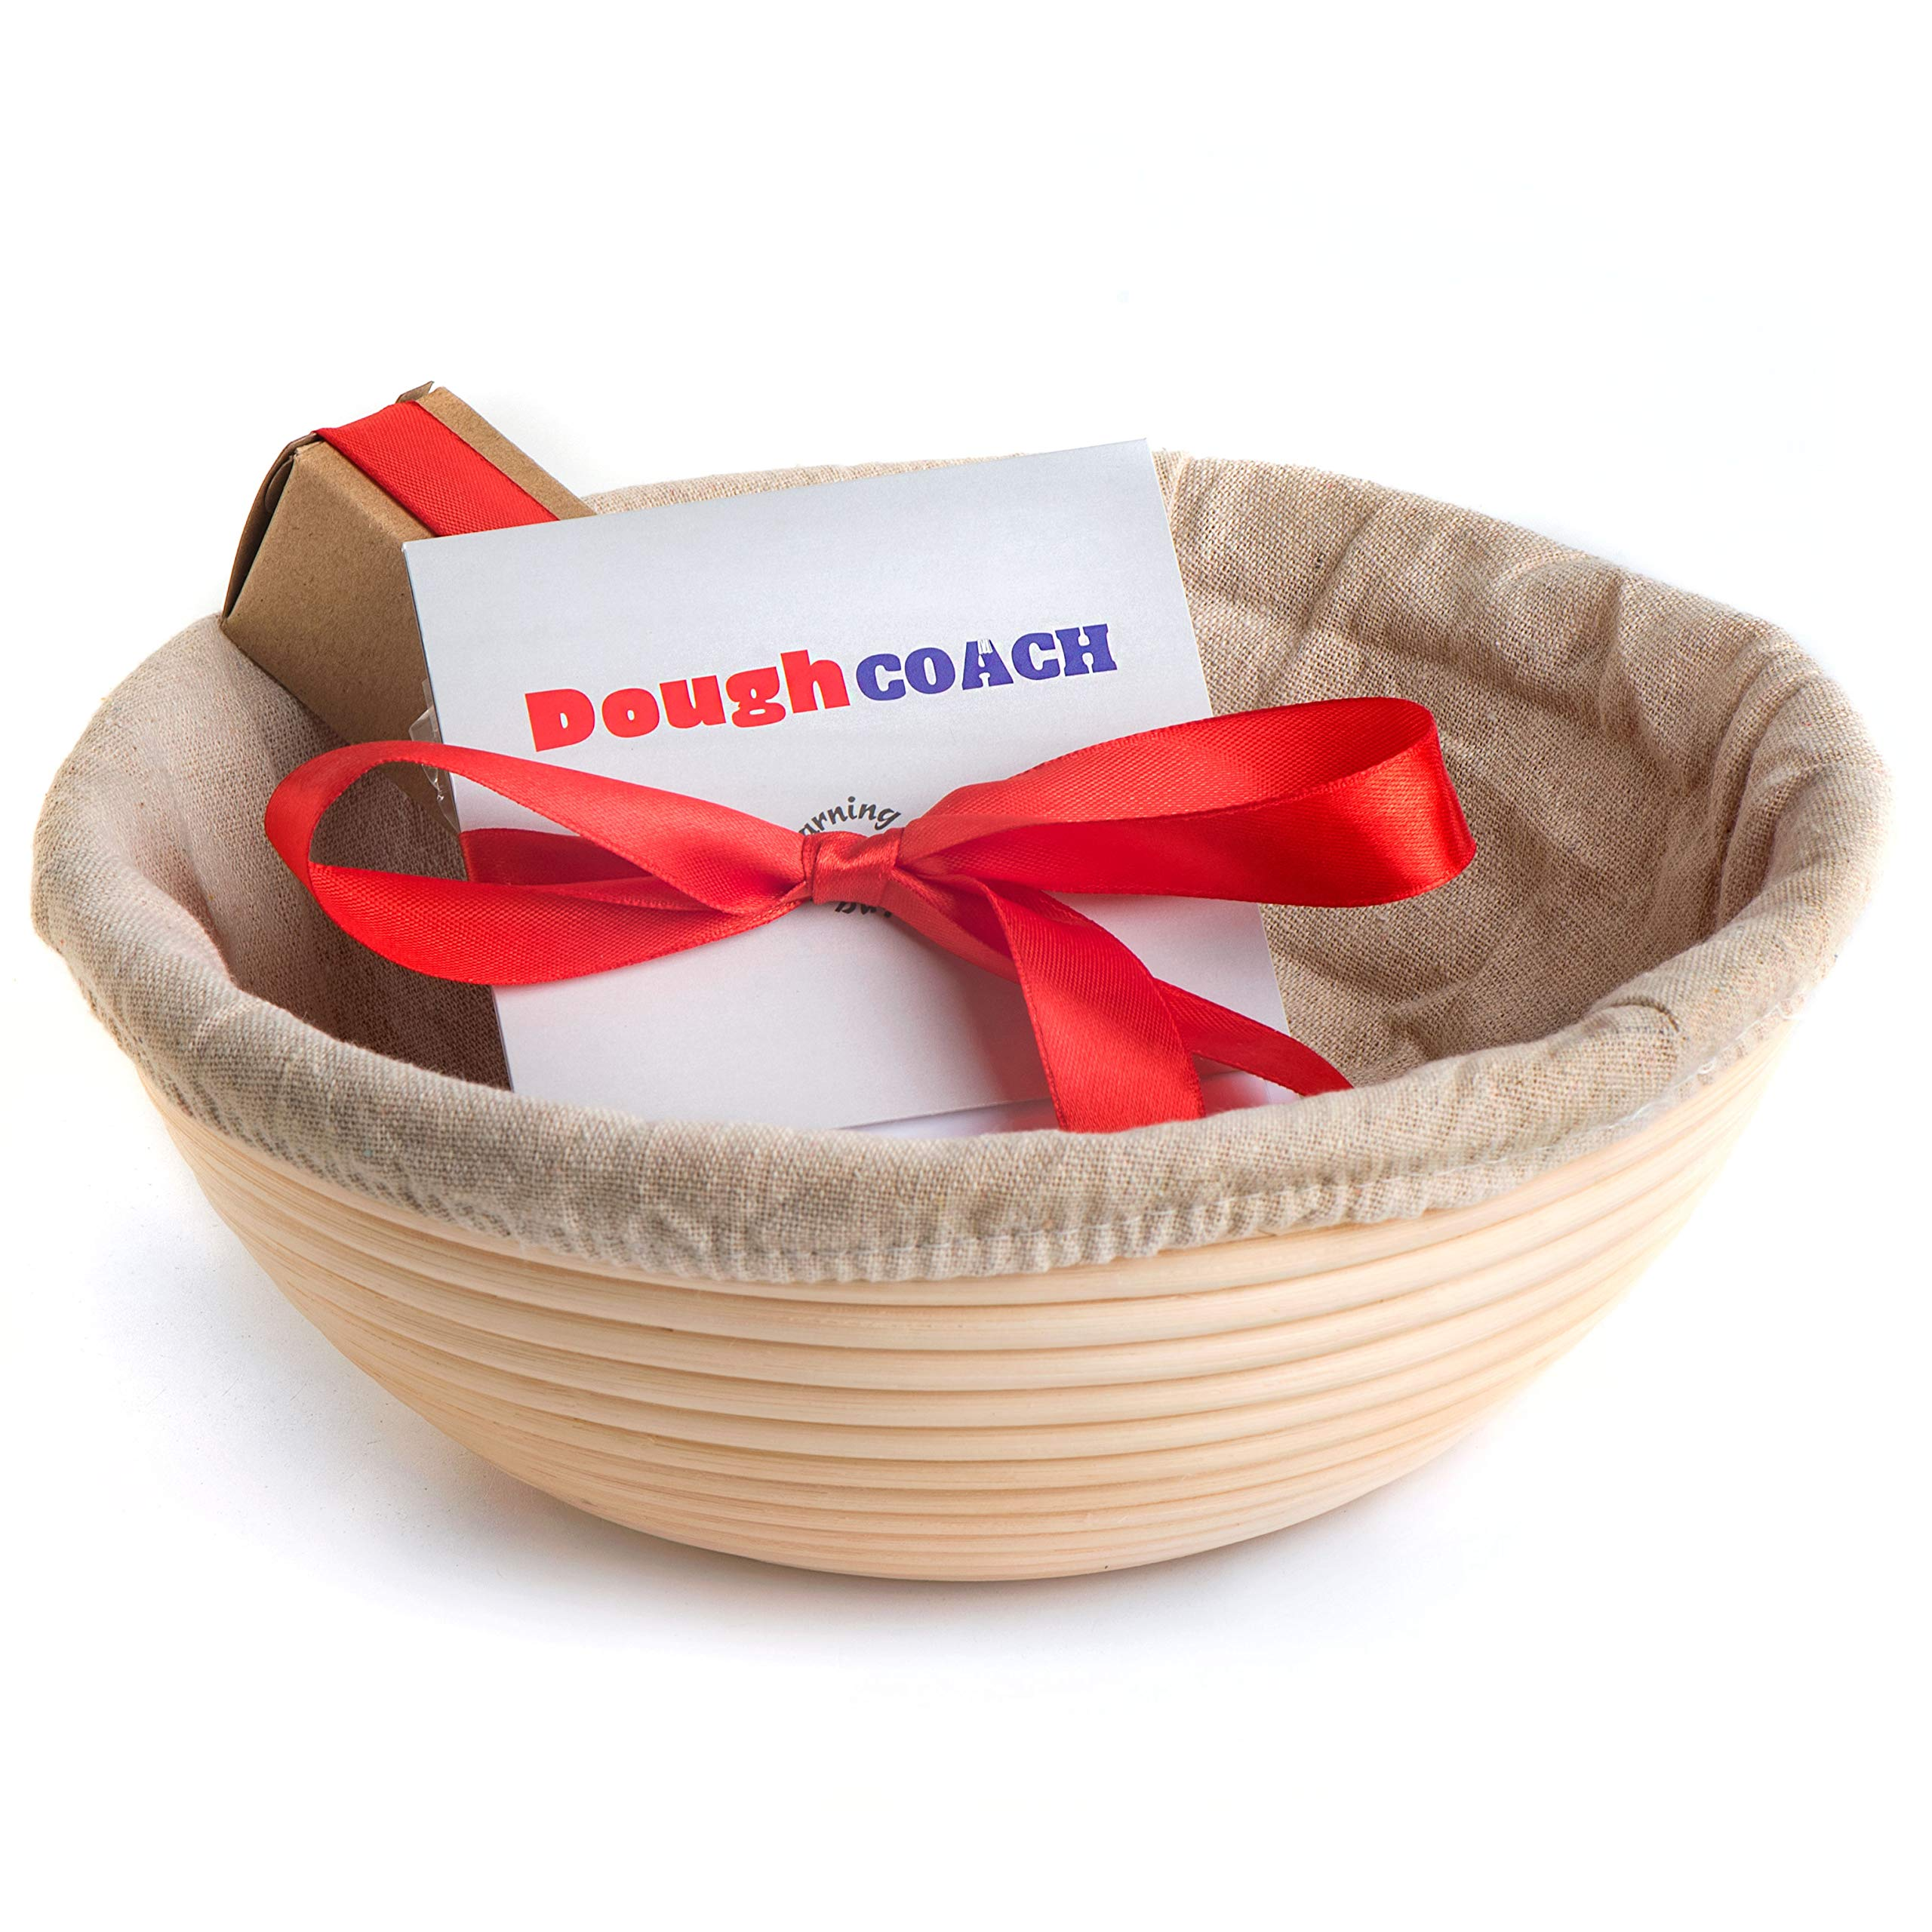 9 inch Banneton Bread Proofing Basket Baking Set Artisan Bread Sourdough Starter Kit Gift for Bakers by Dough Coach